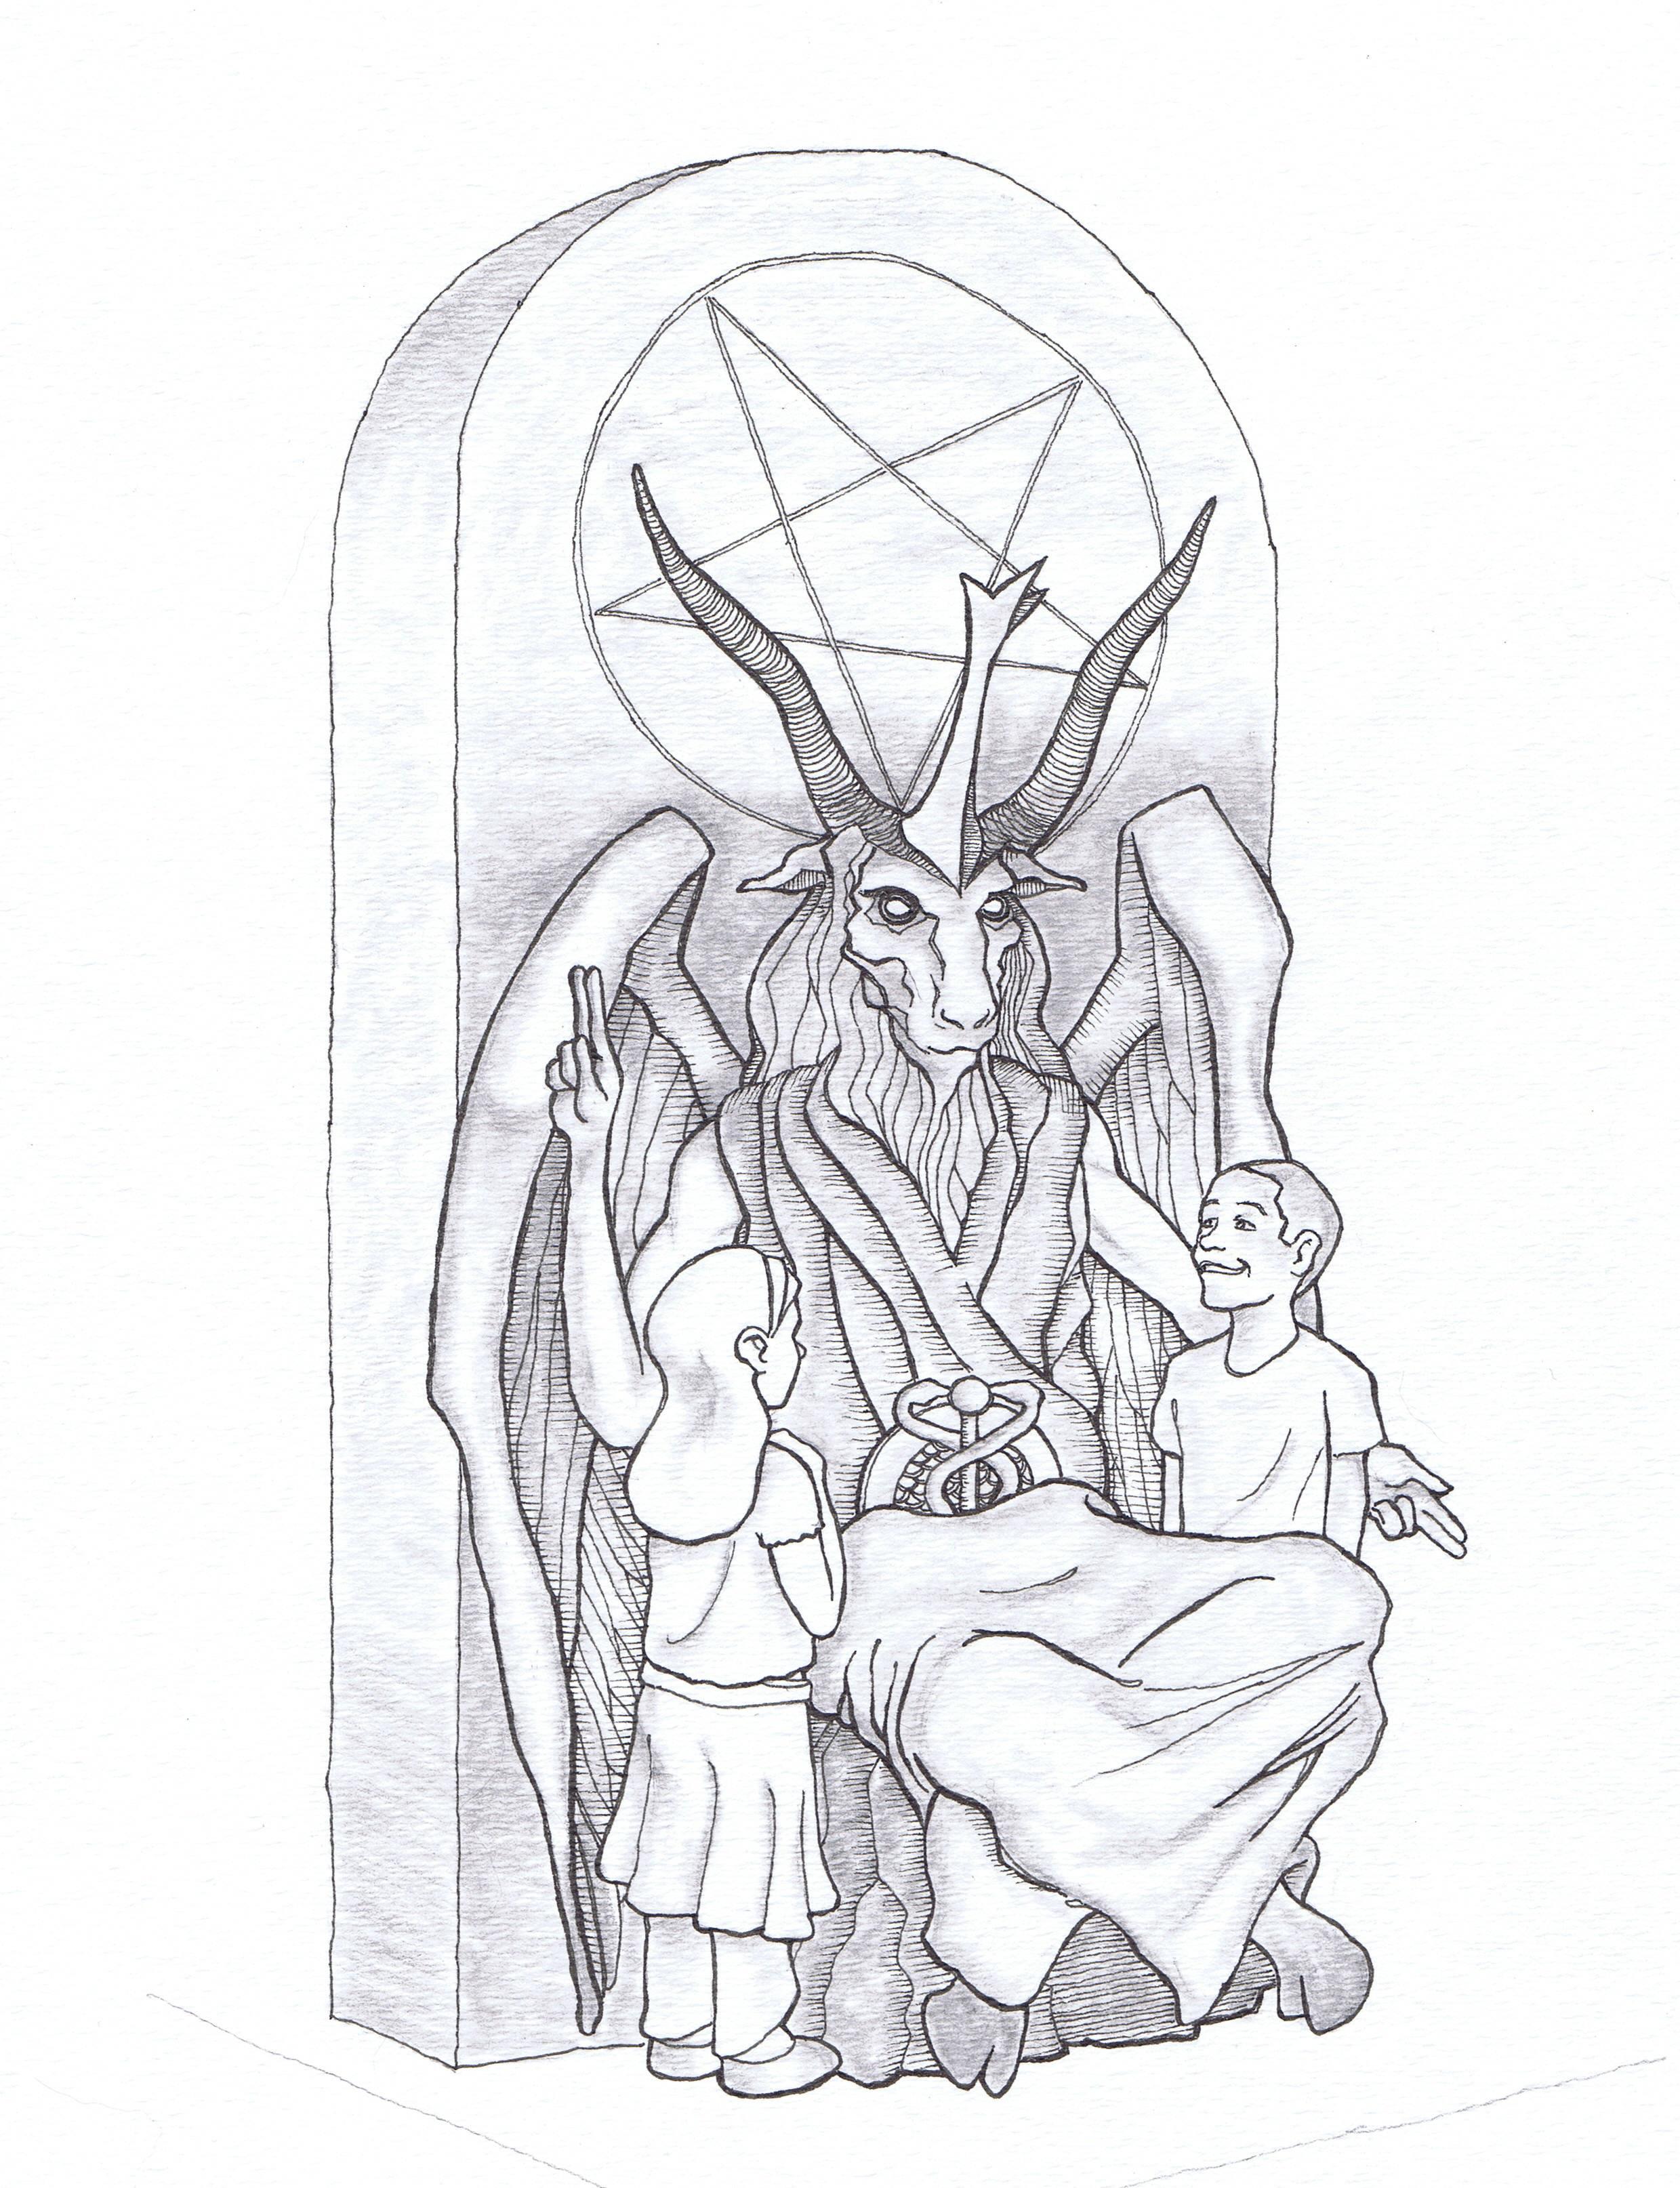 satanist-monumentjpeg-042b8.jpg